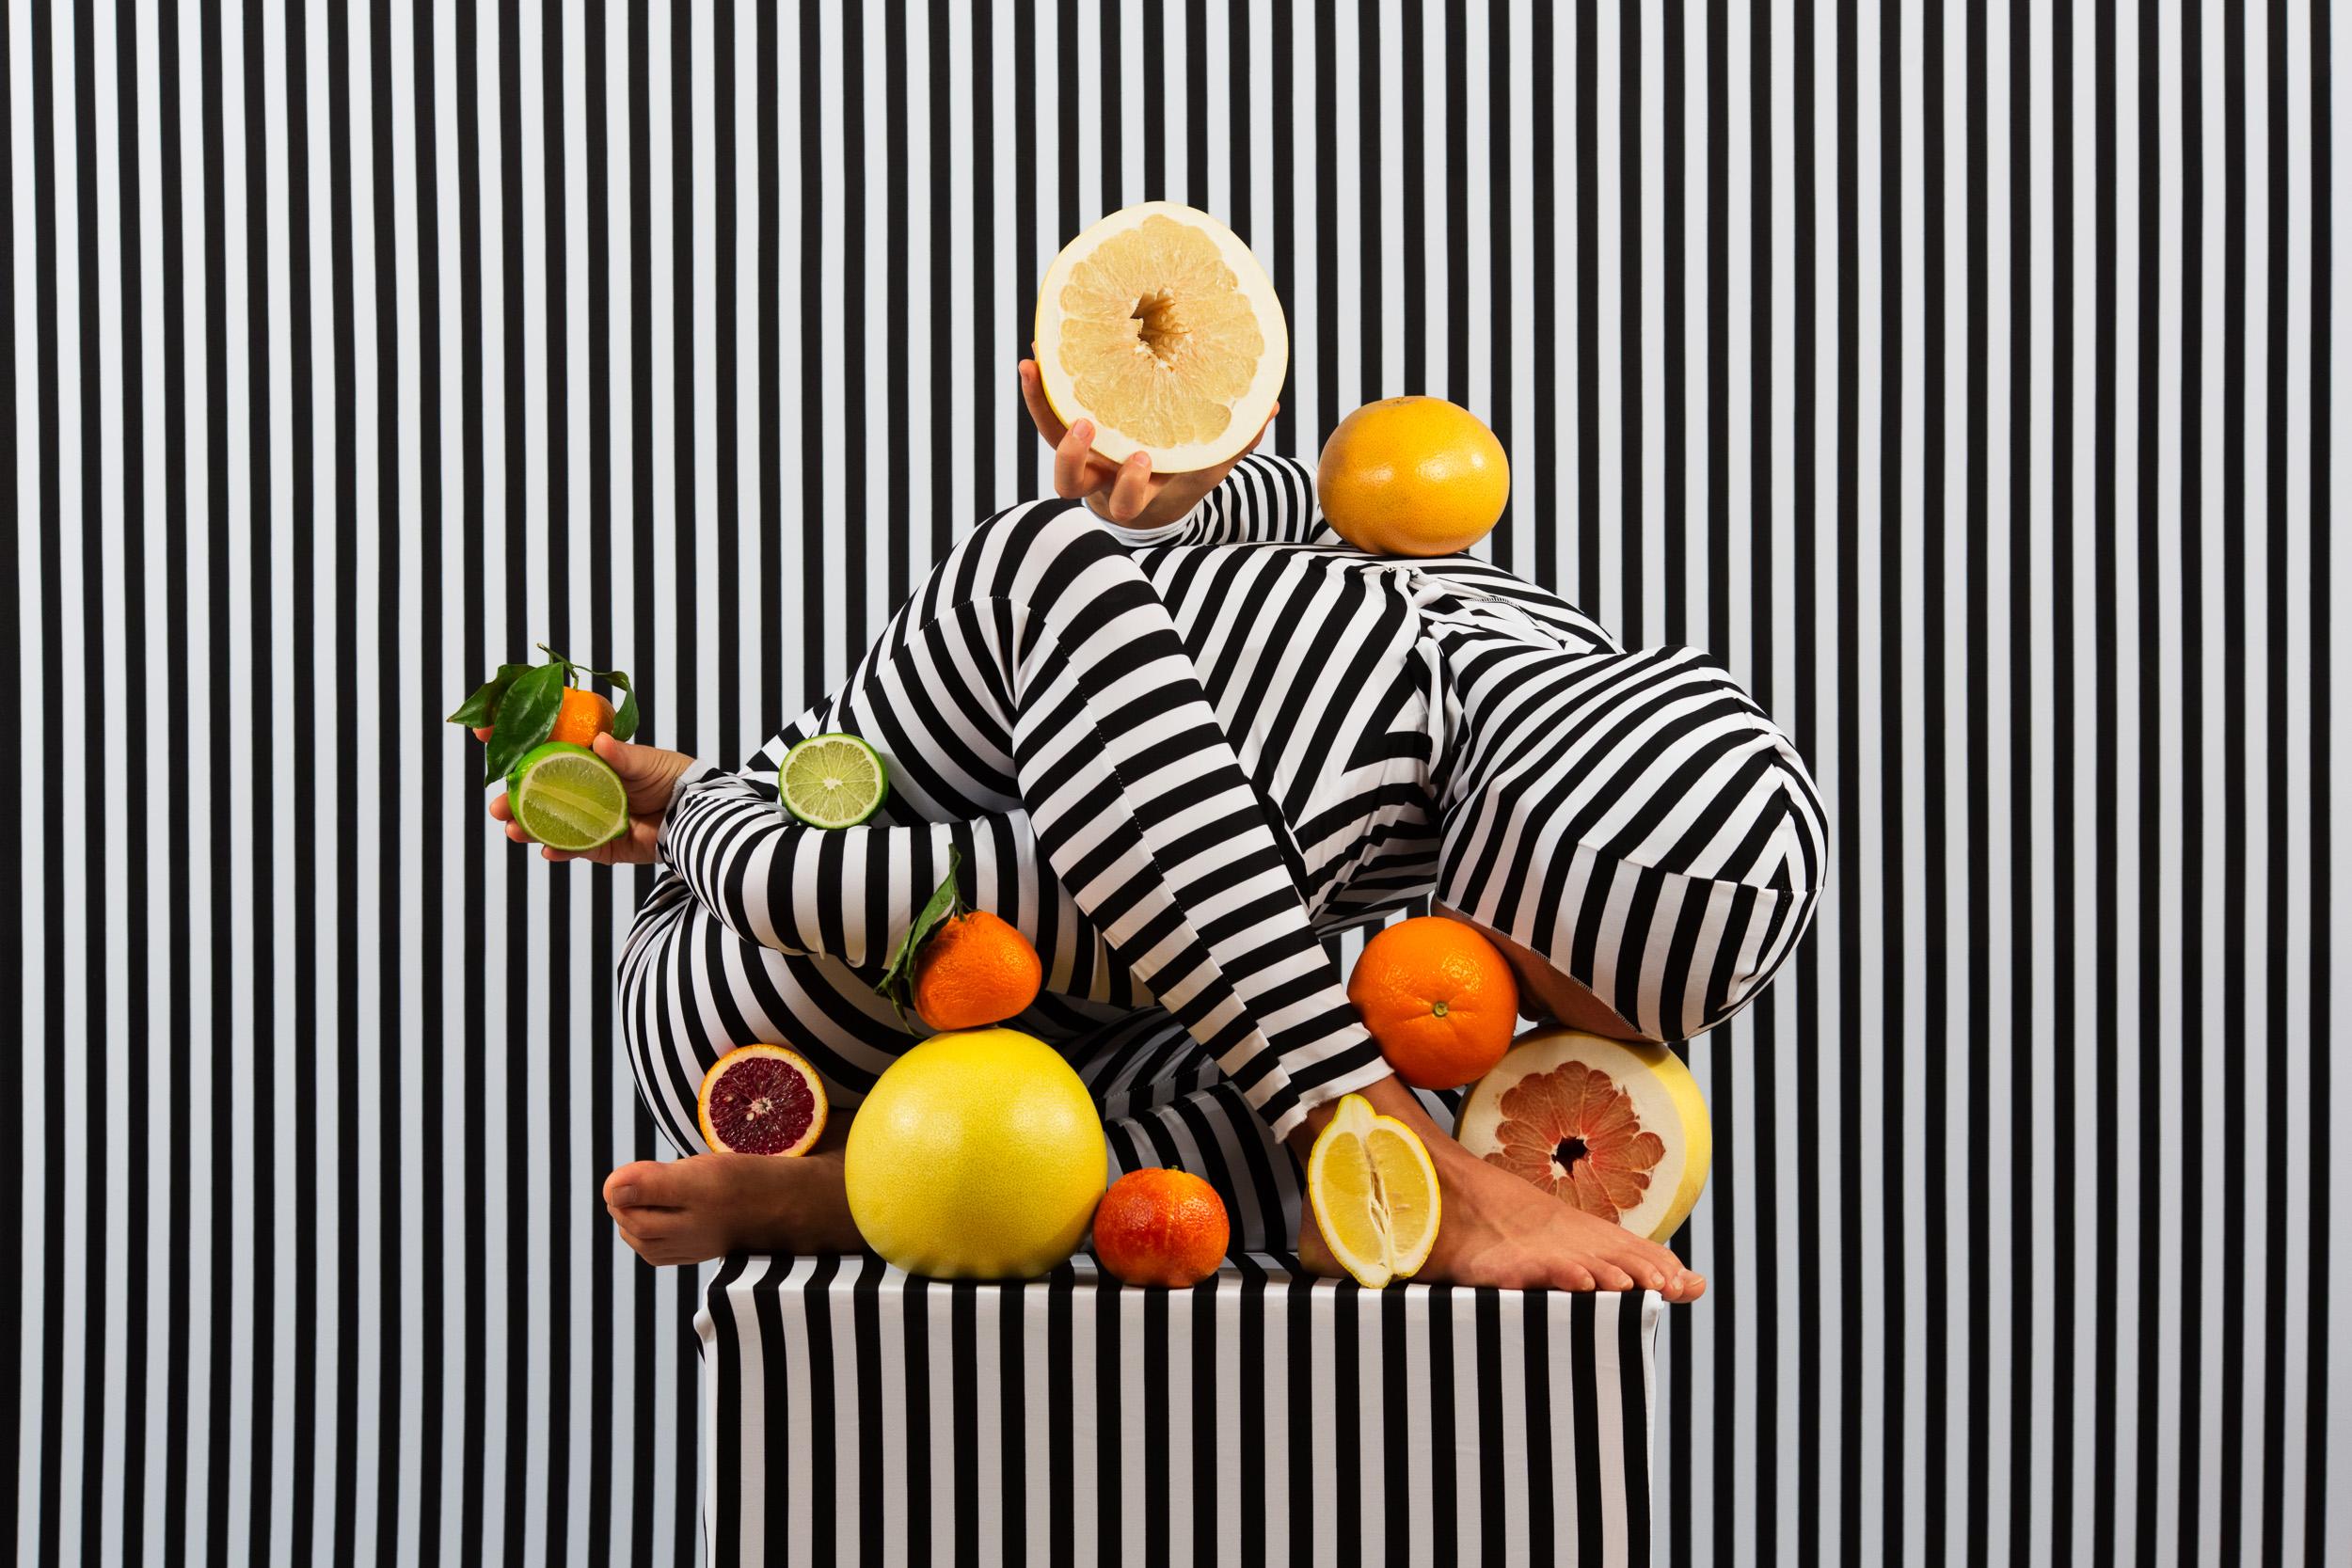 An Arrangement (Stripes Case Study 1)  2018, archival pigment print 61 x 91.5 cm / 24 x 36 in. Edition of 3